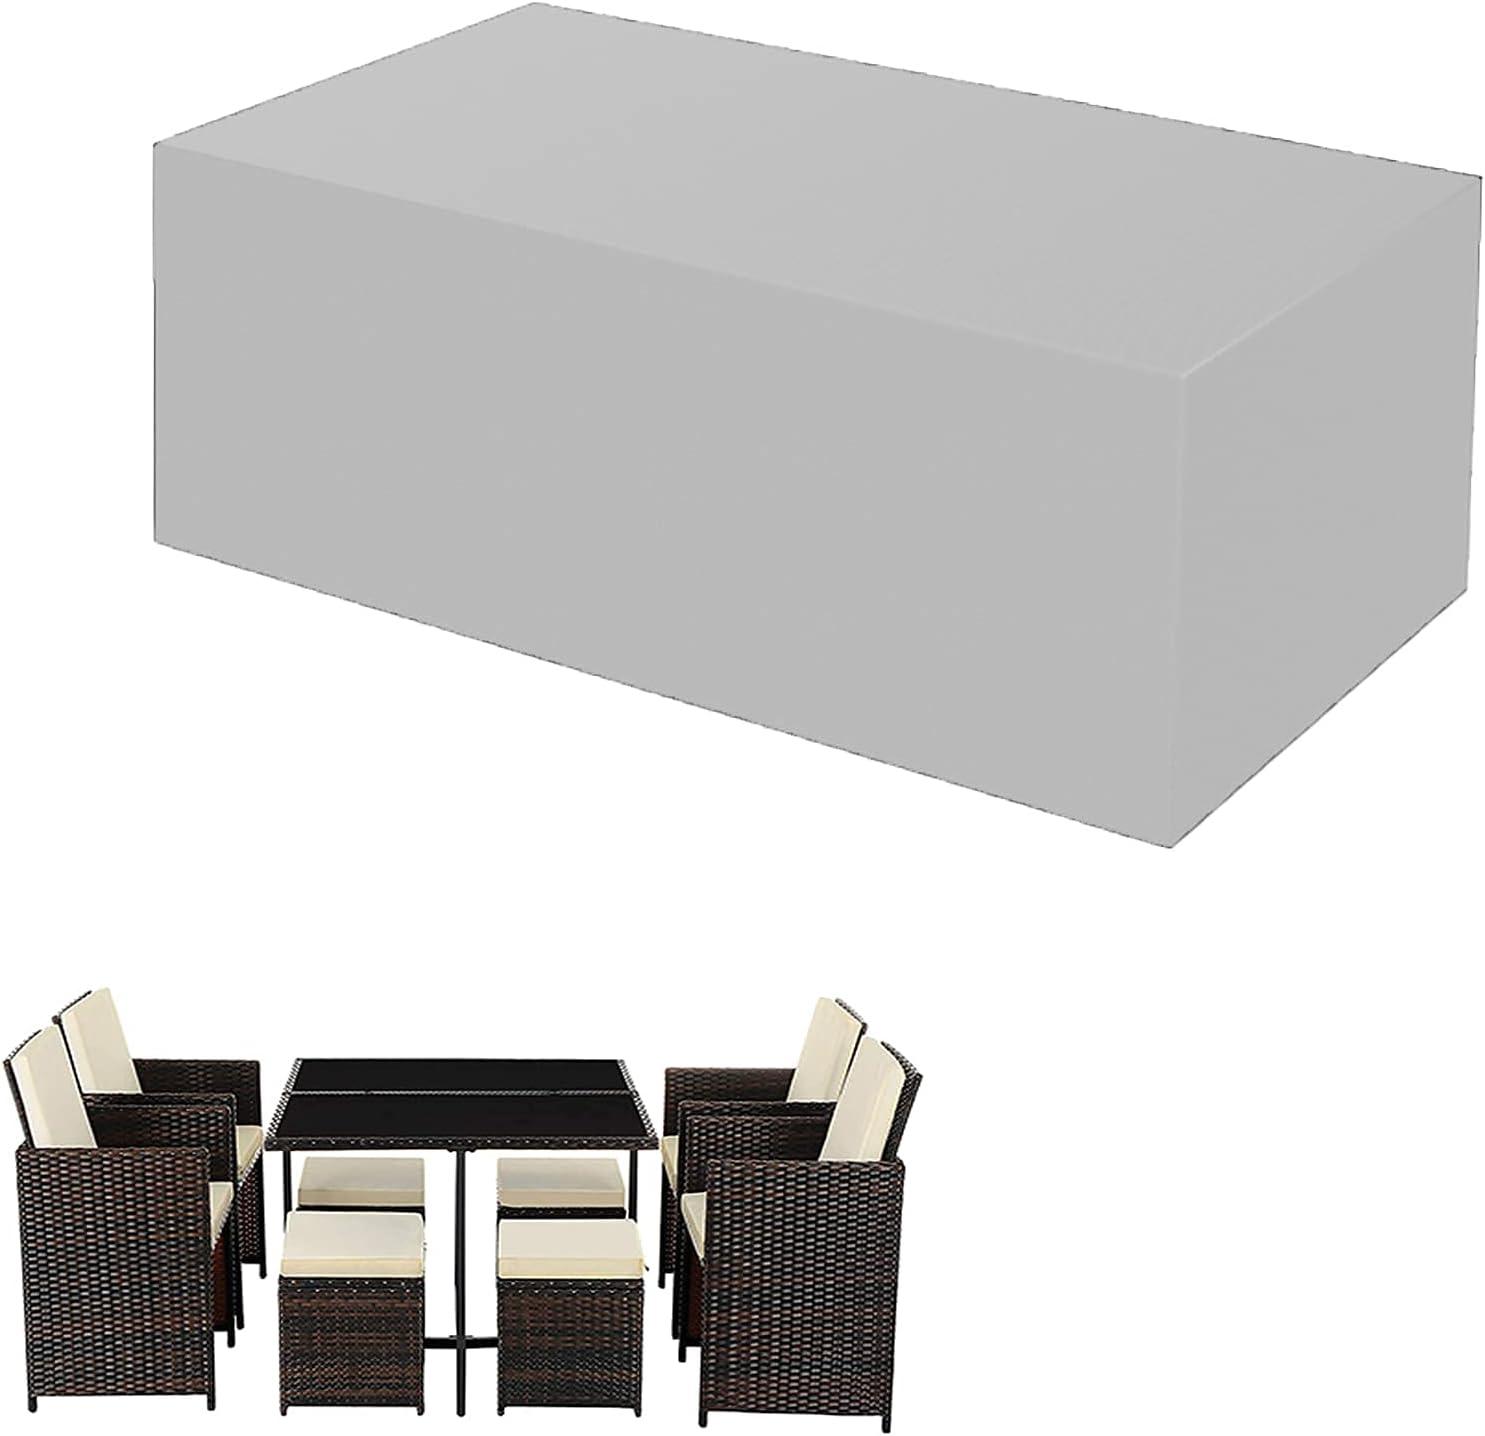 Garden Furniture Cover Heavy Oxford Sale special price Philadelphia Mall Furnitur Duty Cloth